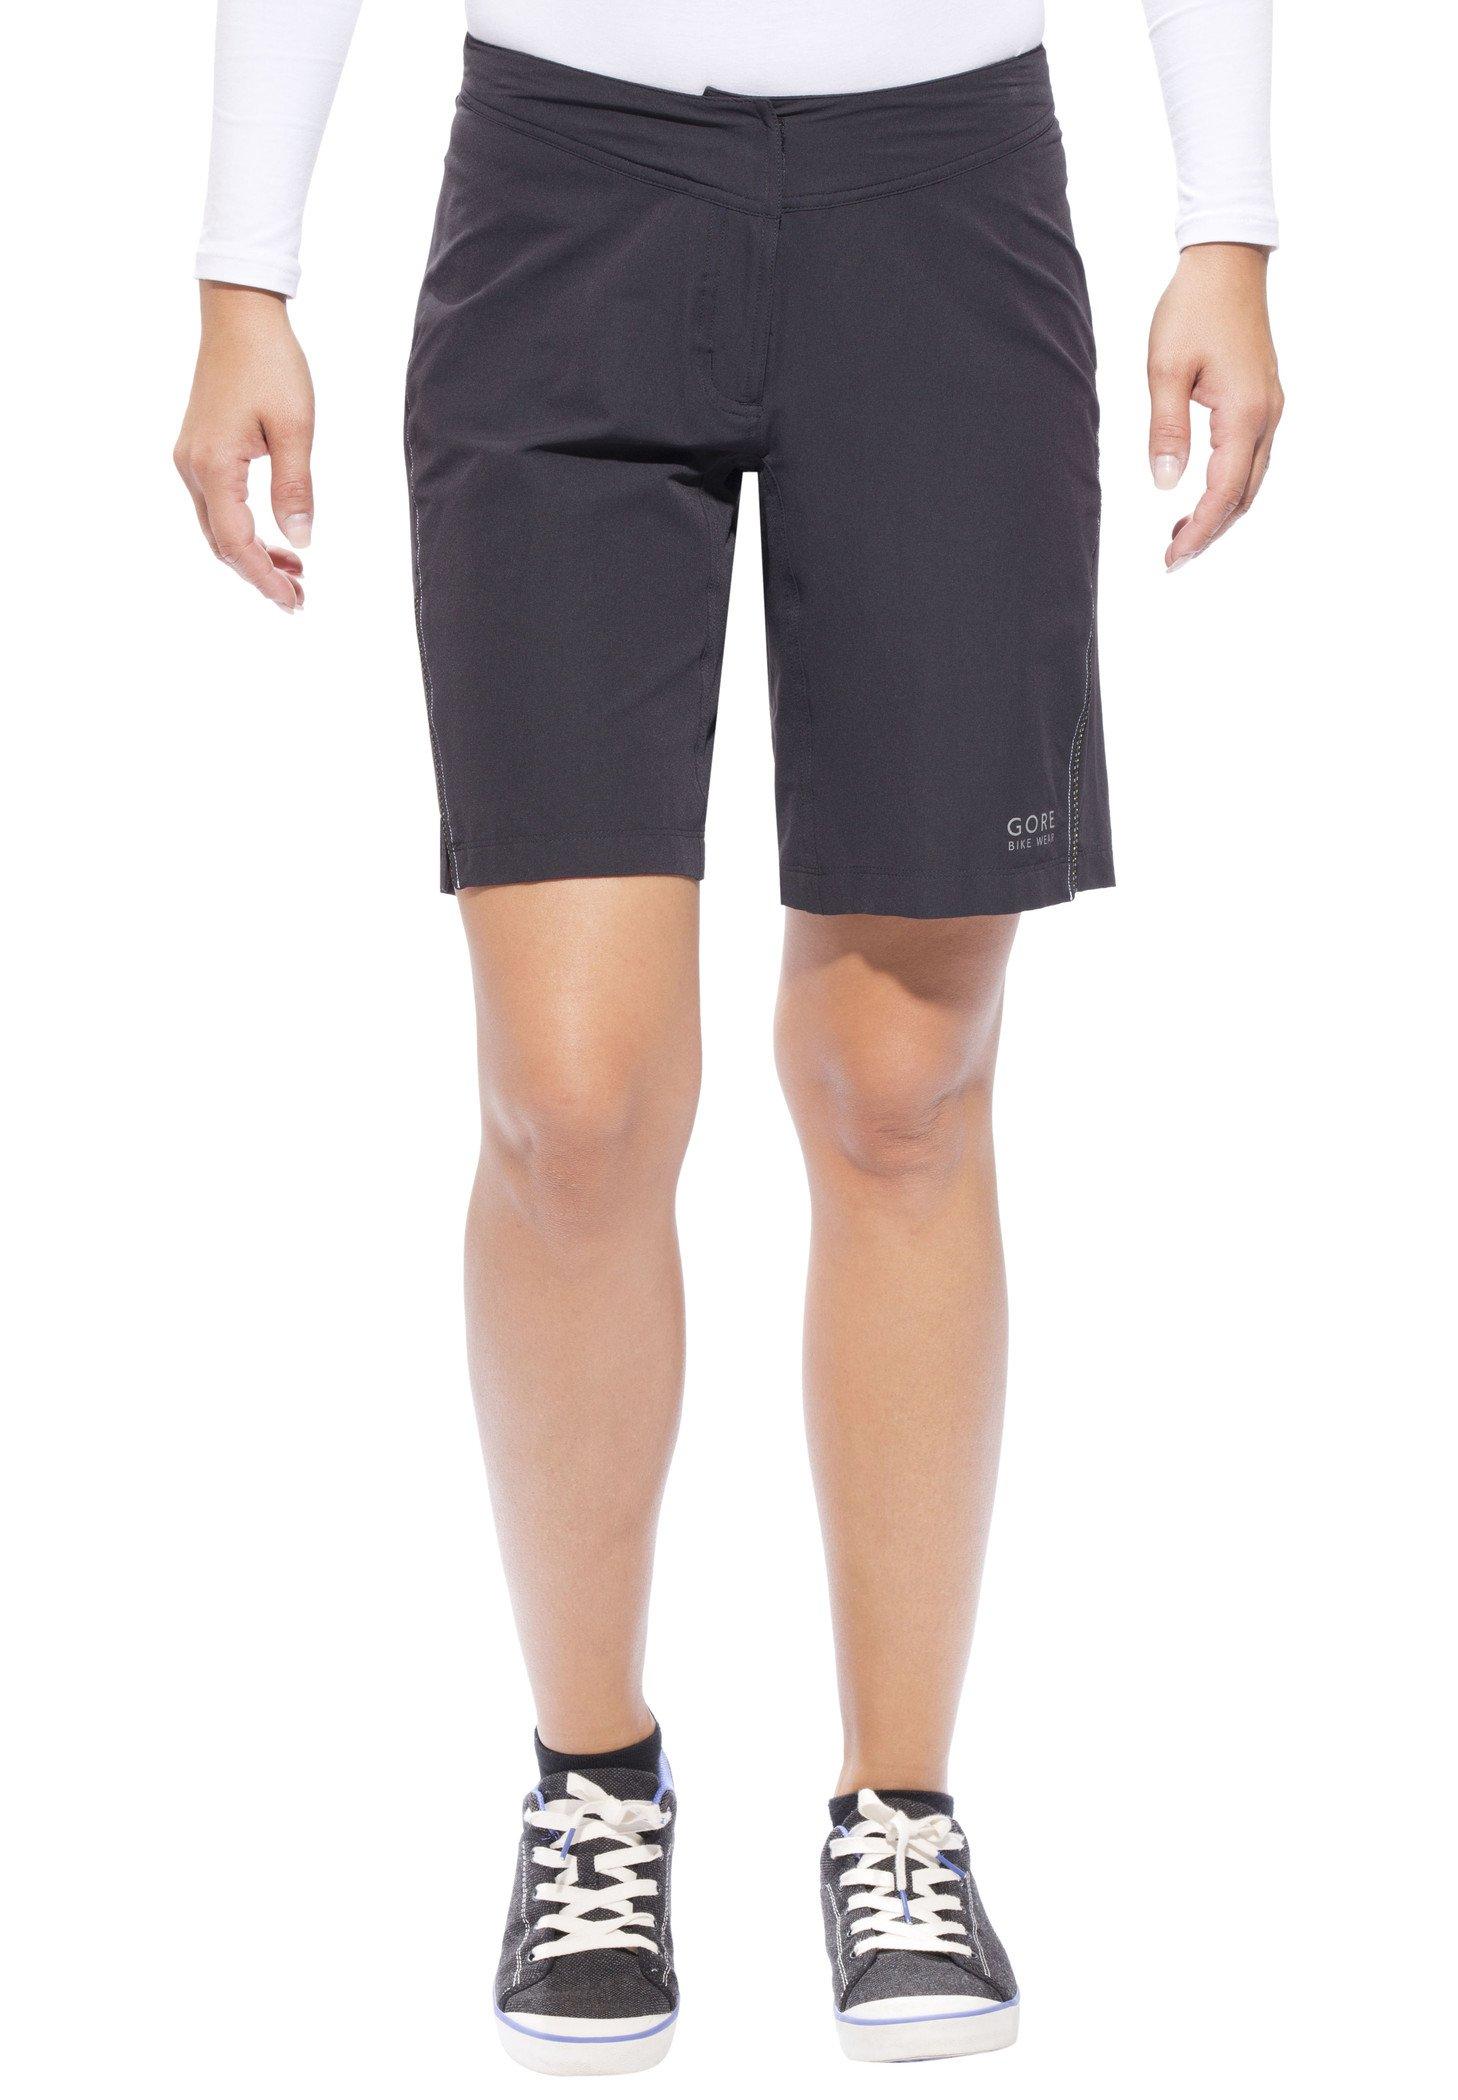 GORE BIKE WEAR Damen Fahrrad-Shorts, Super Leicht, Stretch, GORE Selected Fabrics, LADY Shorts, TLELSP